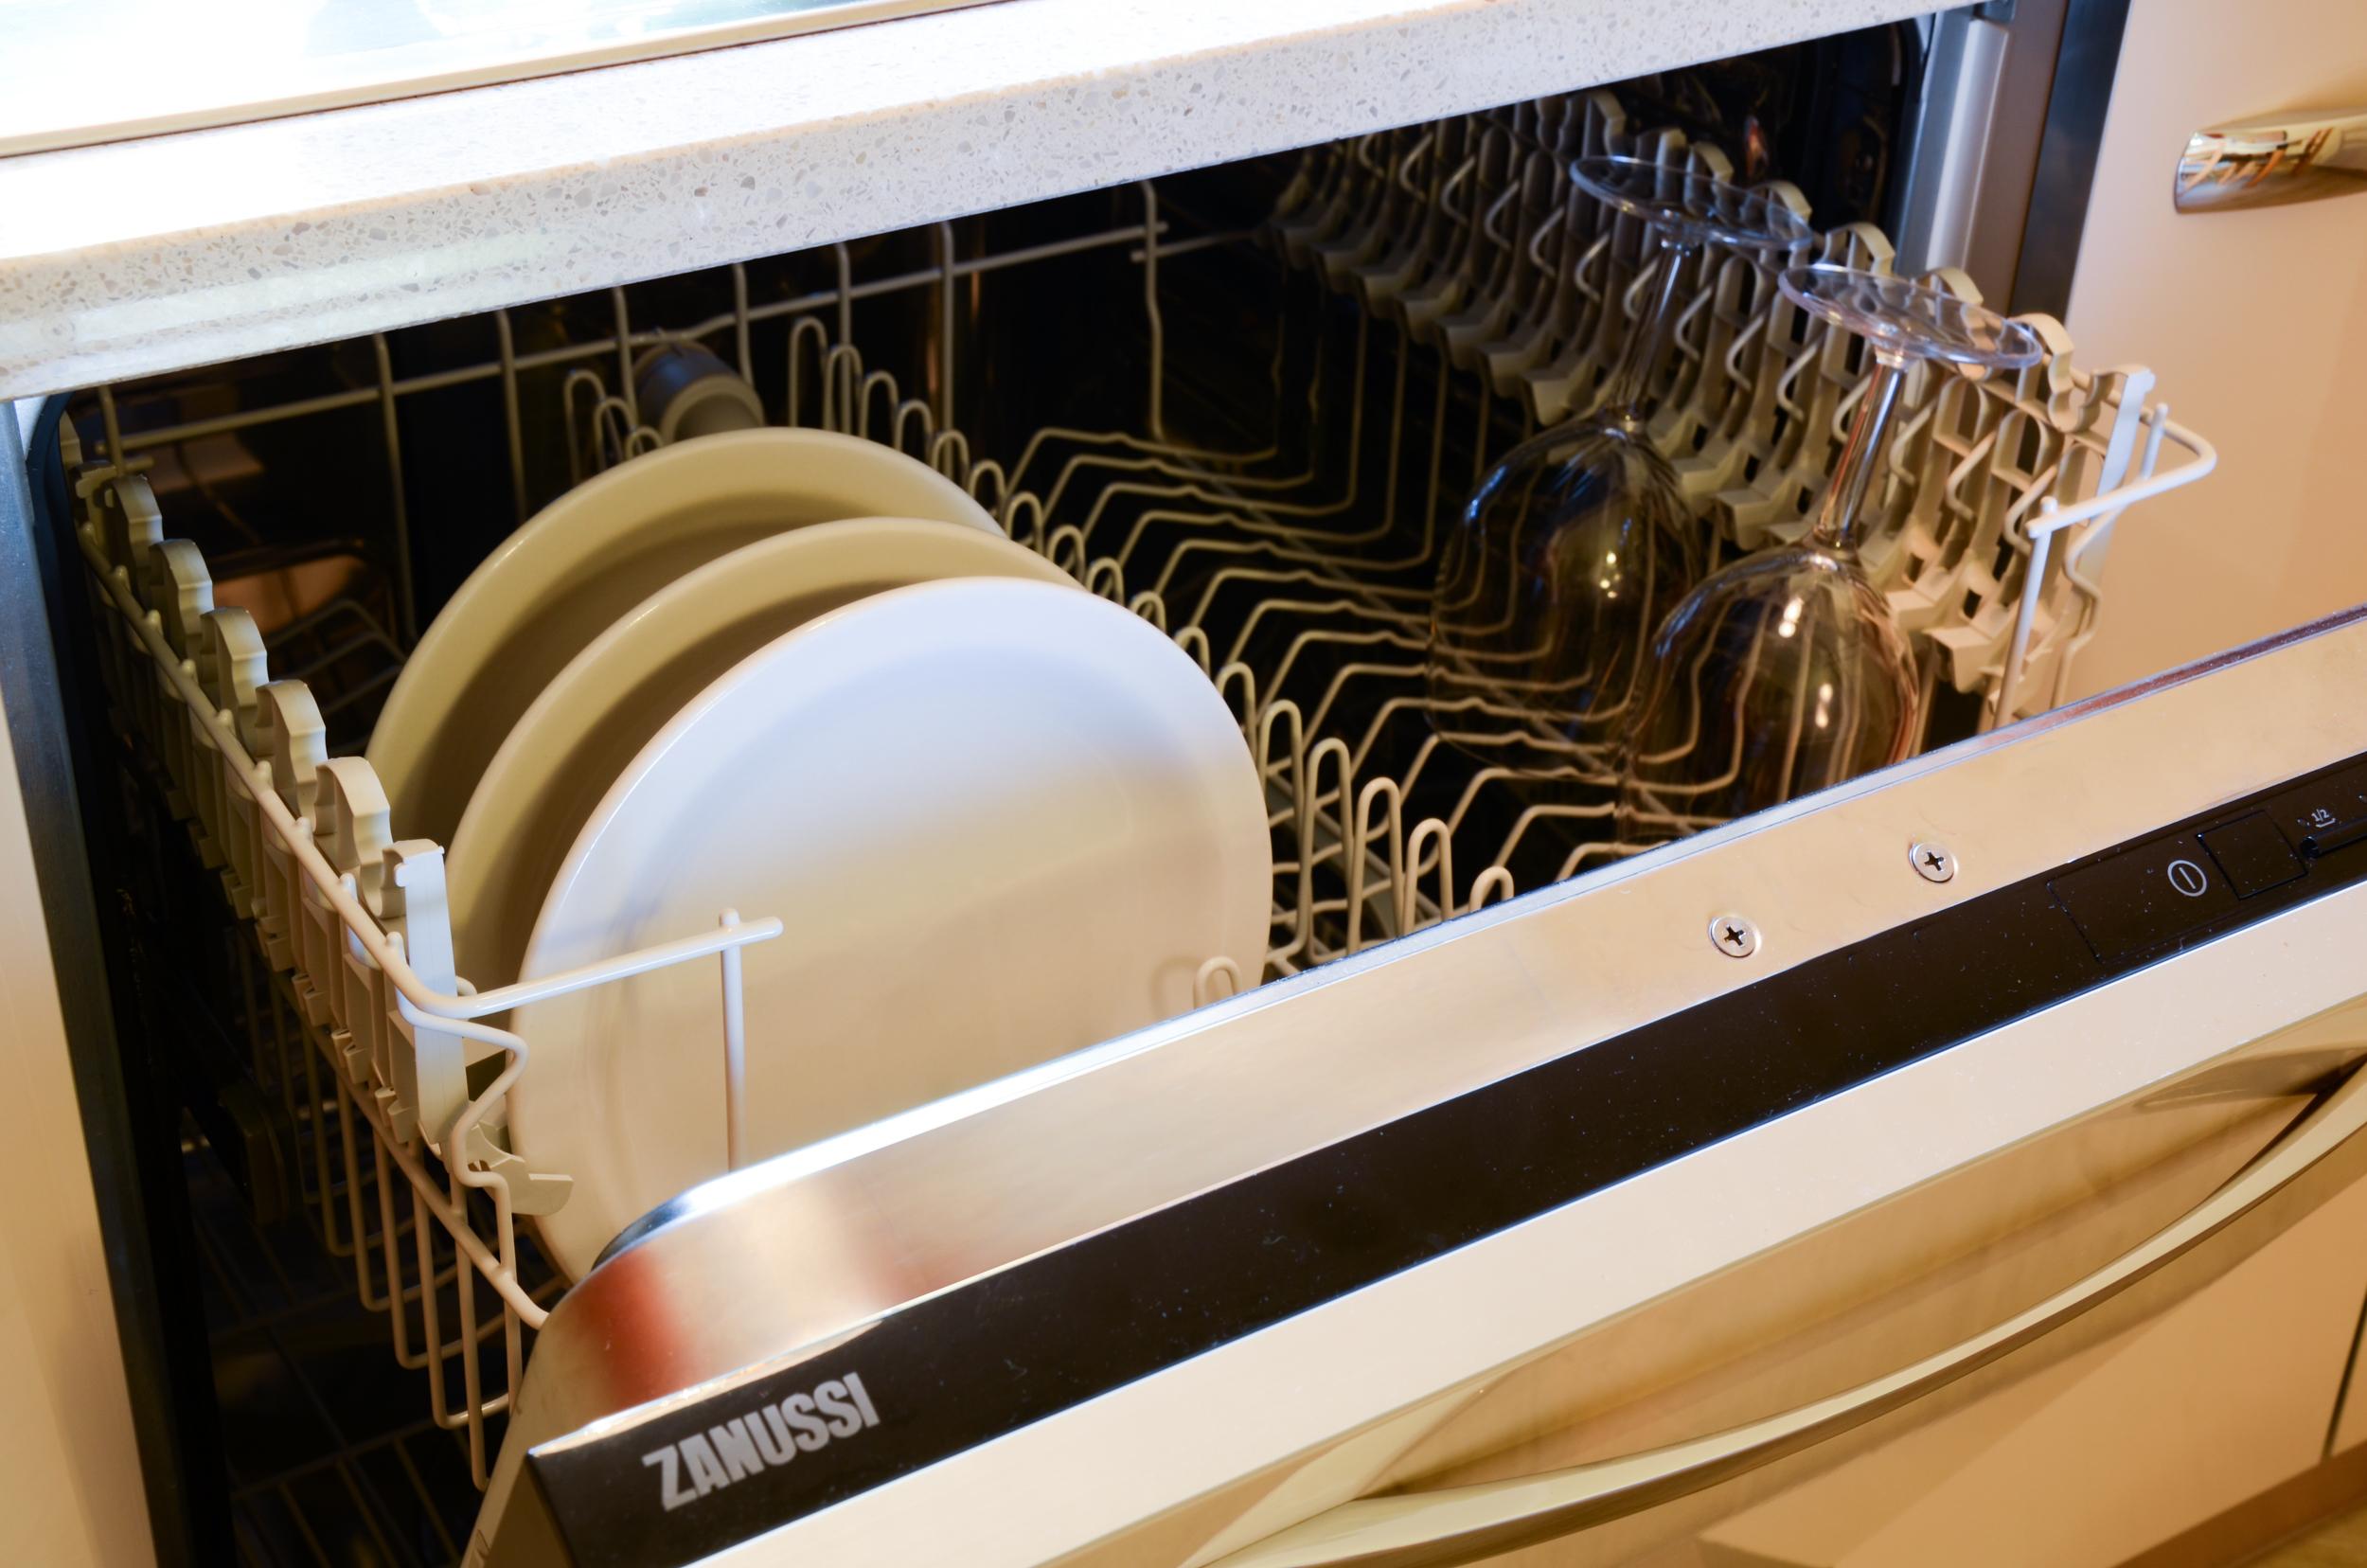 132. lavastoviglie